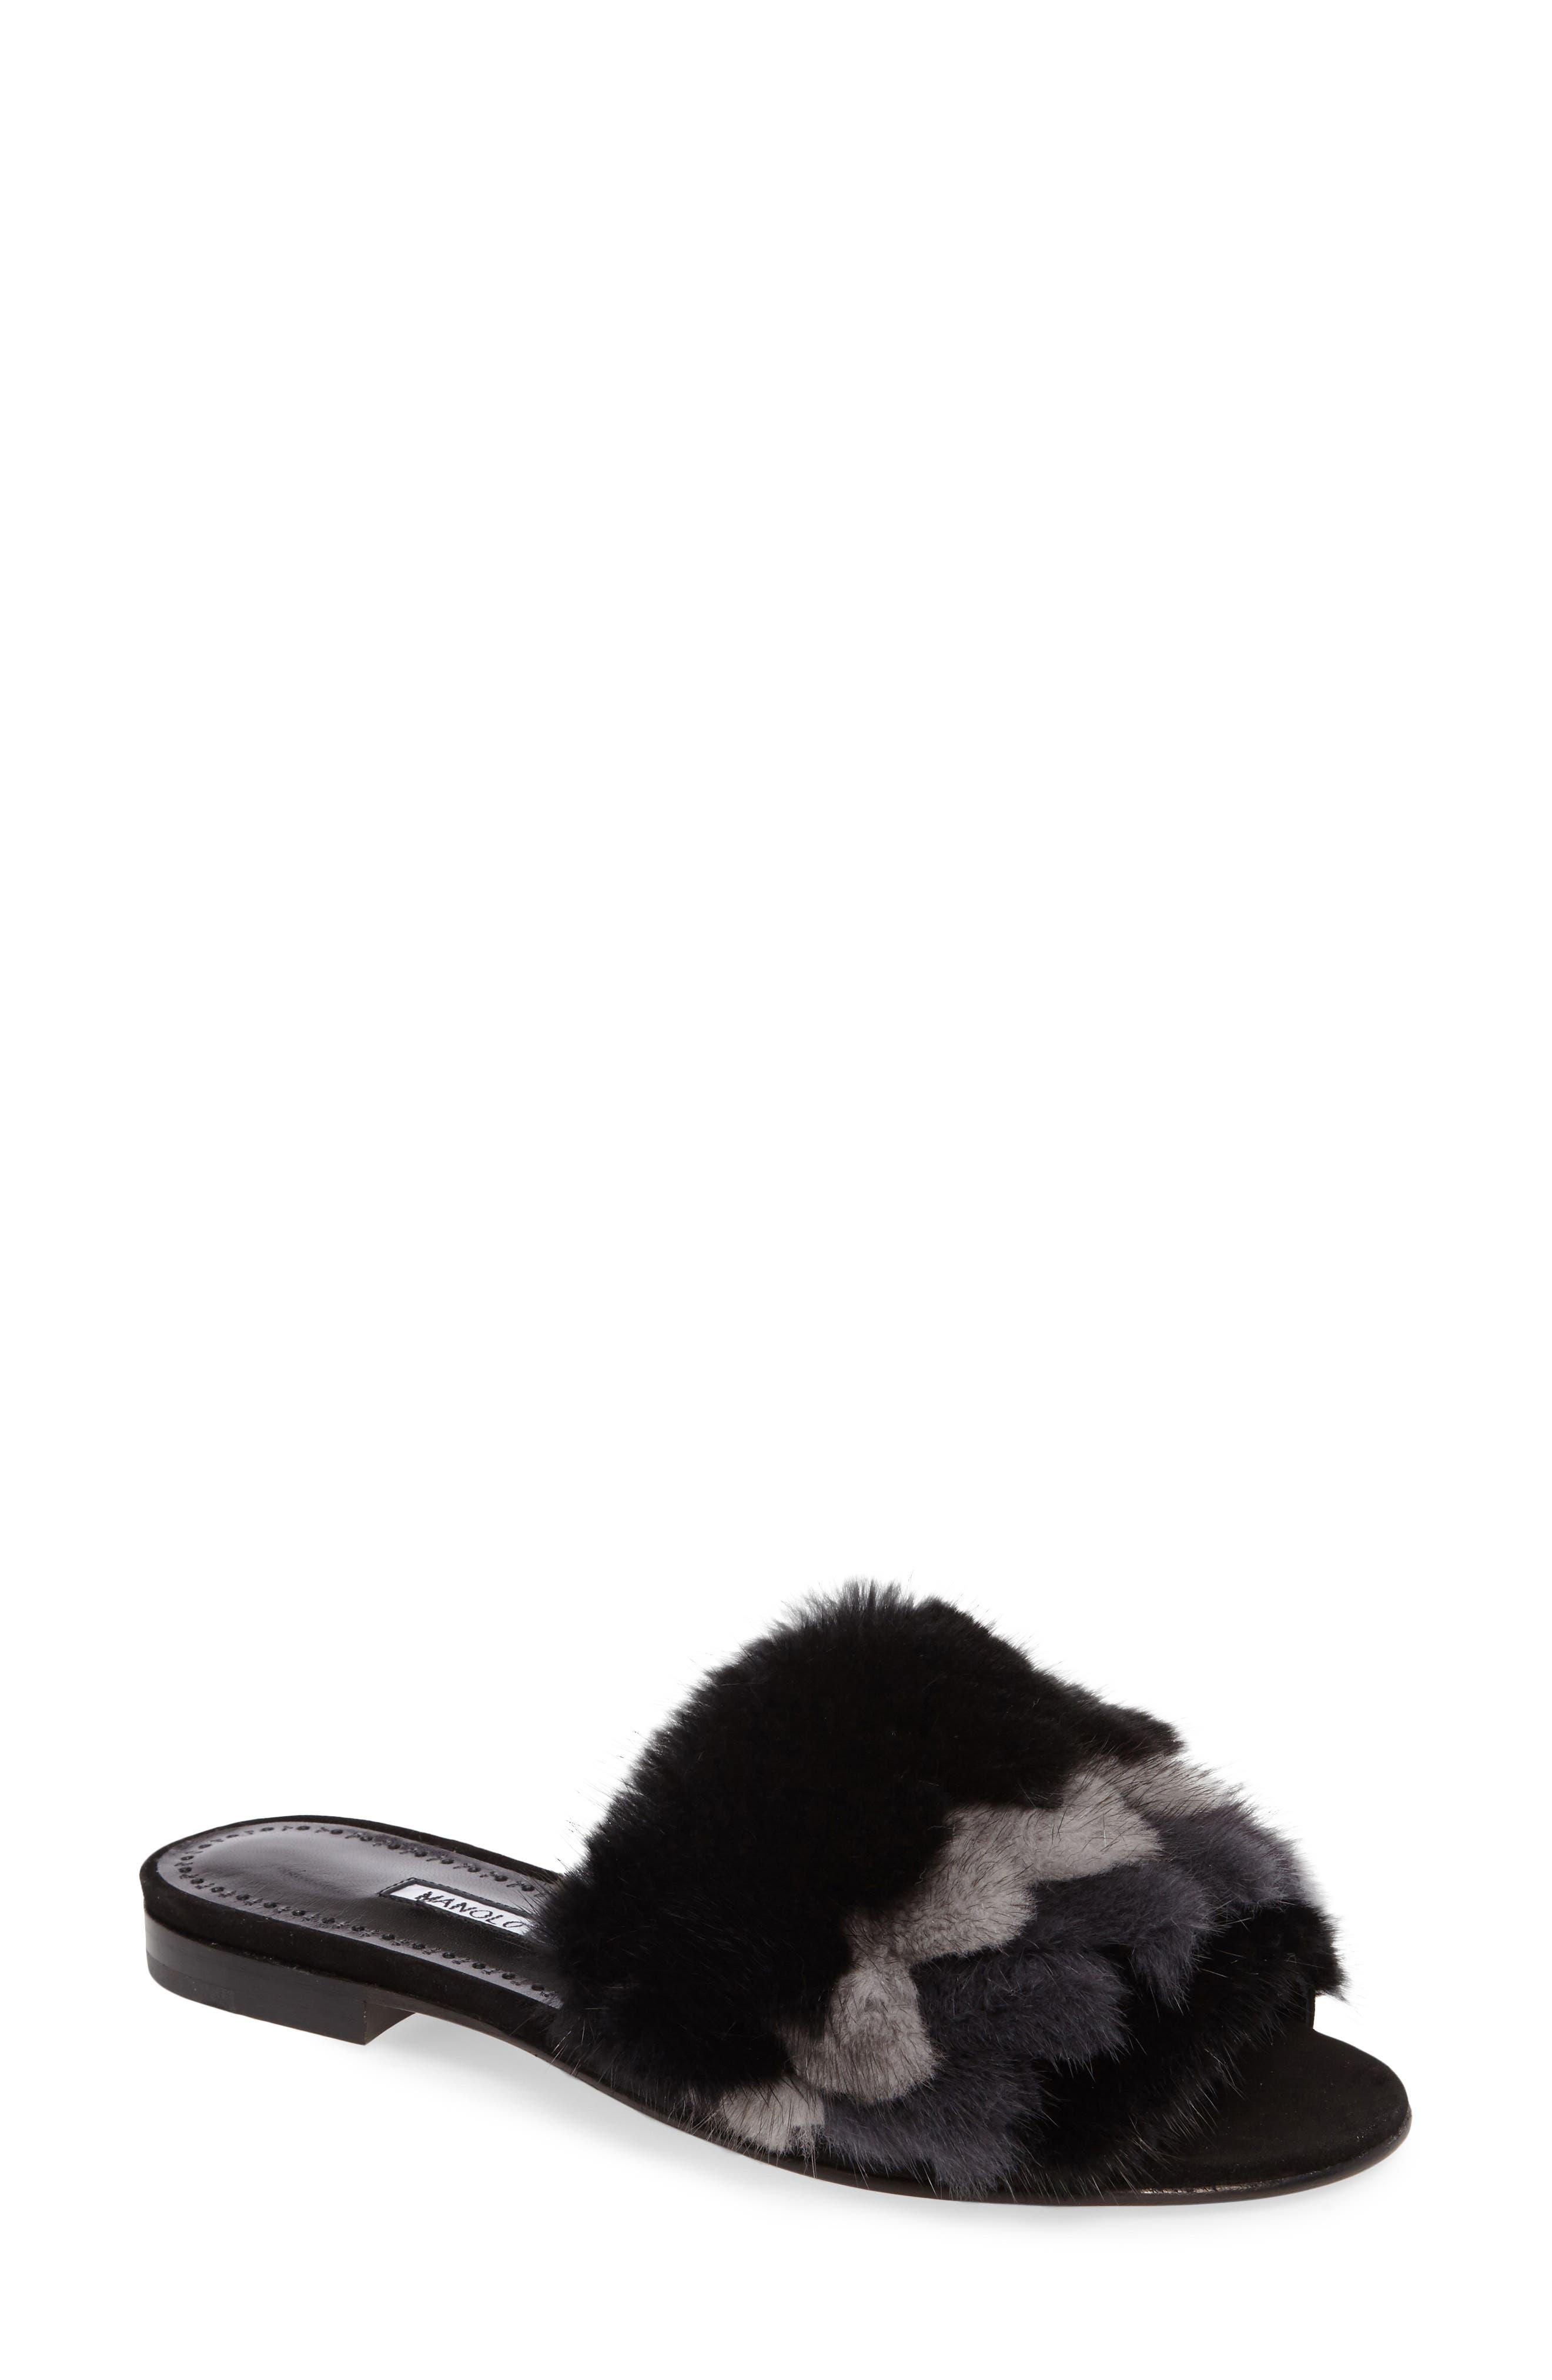 Pelosusmin Genuine Mink Fur Slide Sandal,                             Main thumbnail 1, color,                             001